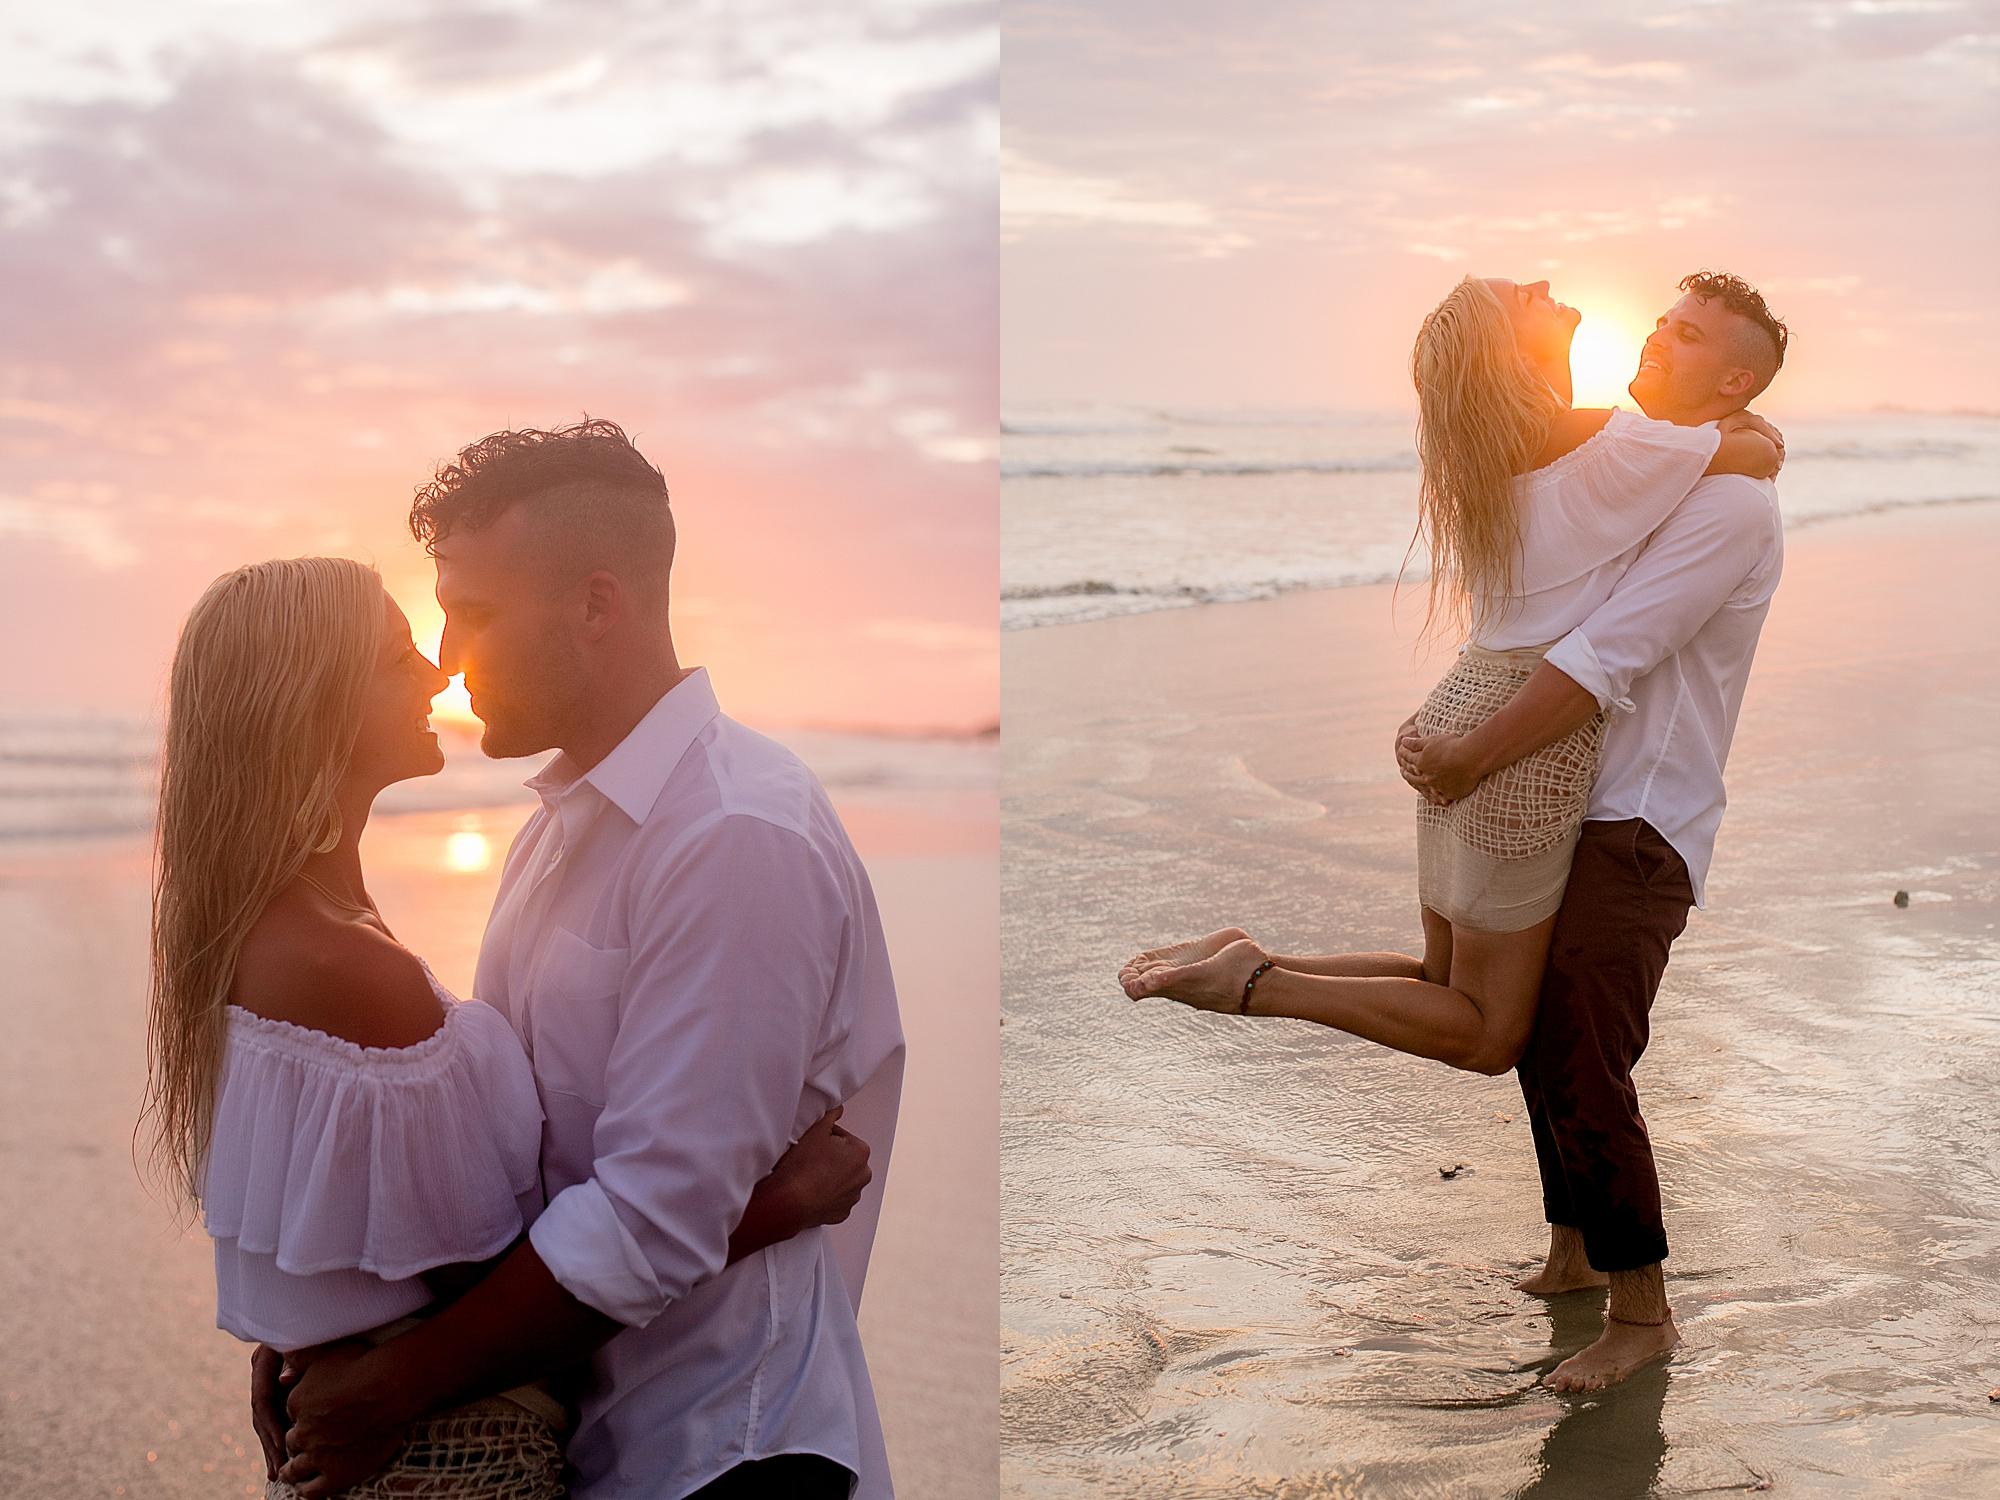 Epic and Adventurous Travel Wedding and Portrait Photographer in Nosara, Costa Rica - Kelee Bovelle @xokelee @keleeb - 4.jpg